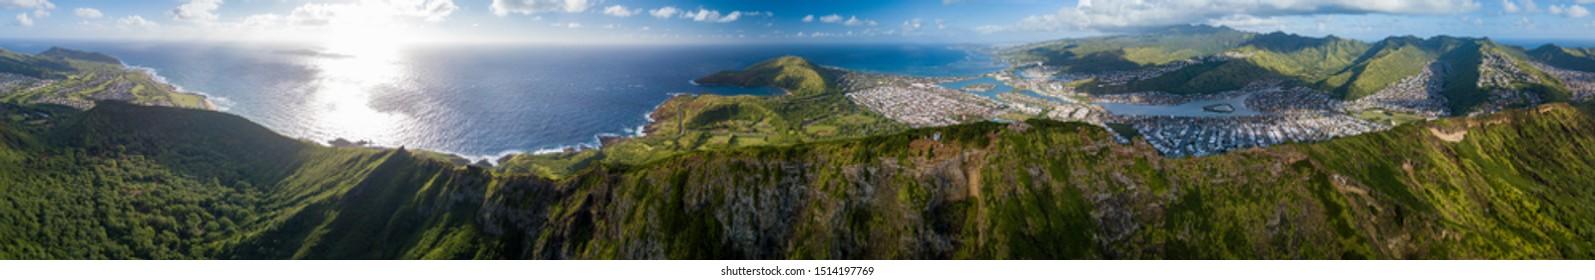 Aerial panorama of the island of Oahu as seen from the Koko Head mountain with Hanauma Bay and Honolulu city in the frame. Hawaii